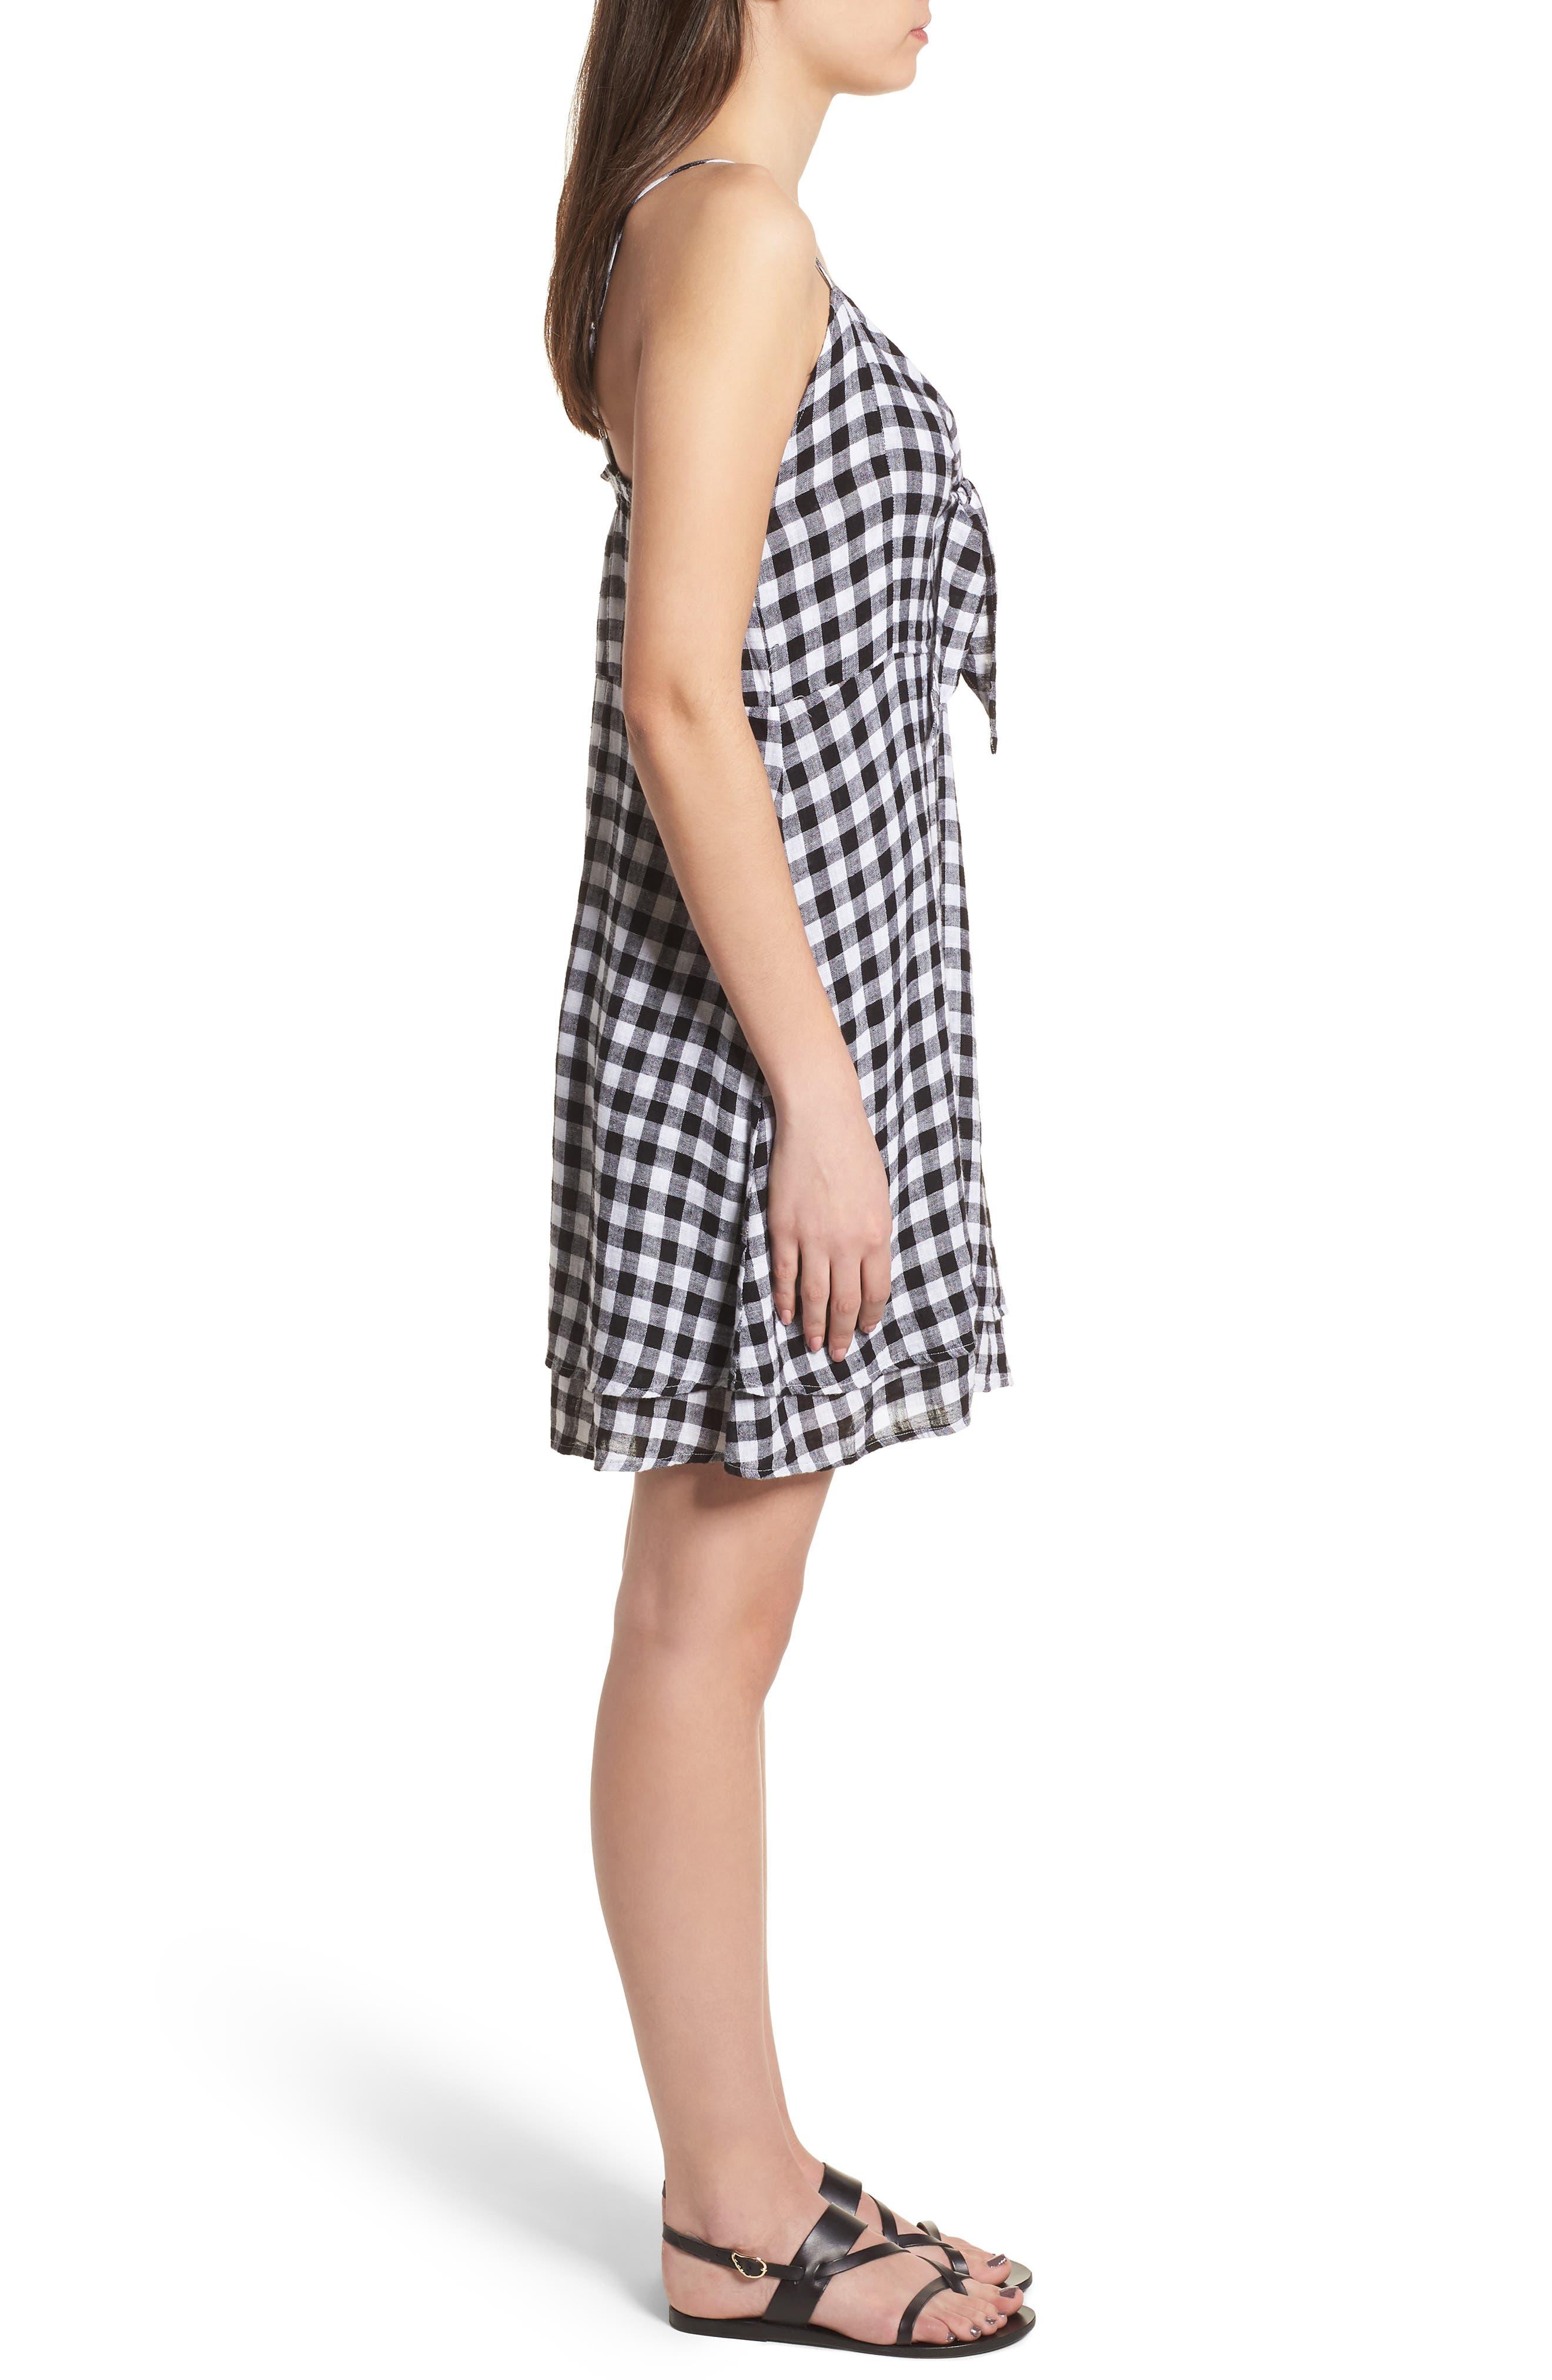 August Gingham Tie Front Dress,                             Alternate thumbnail 3, color,                             Black Gingham